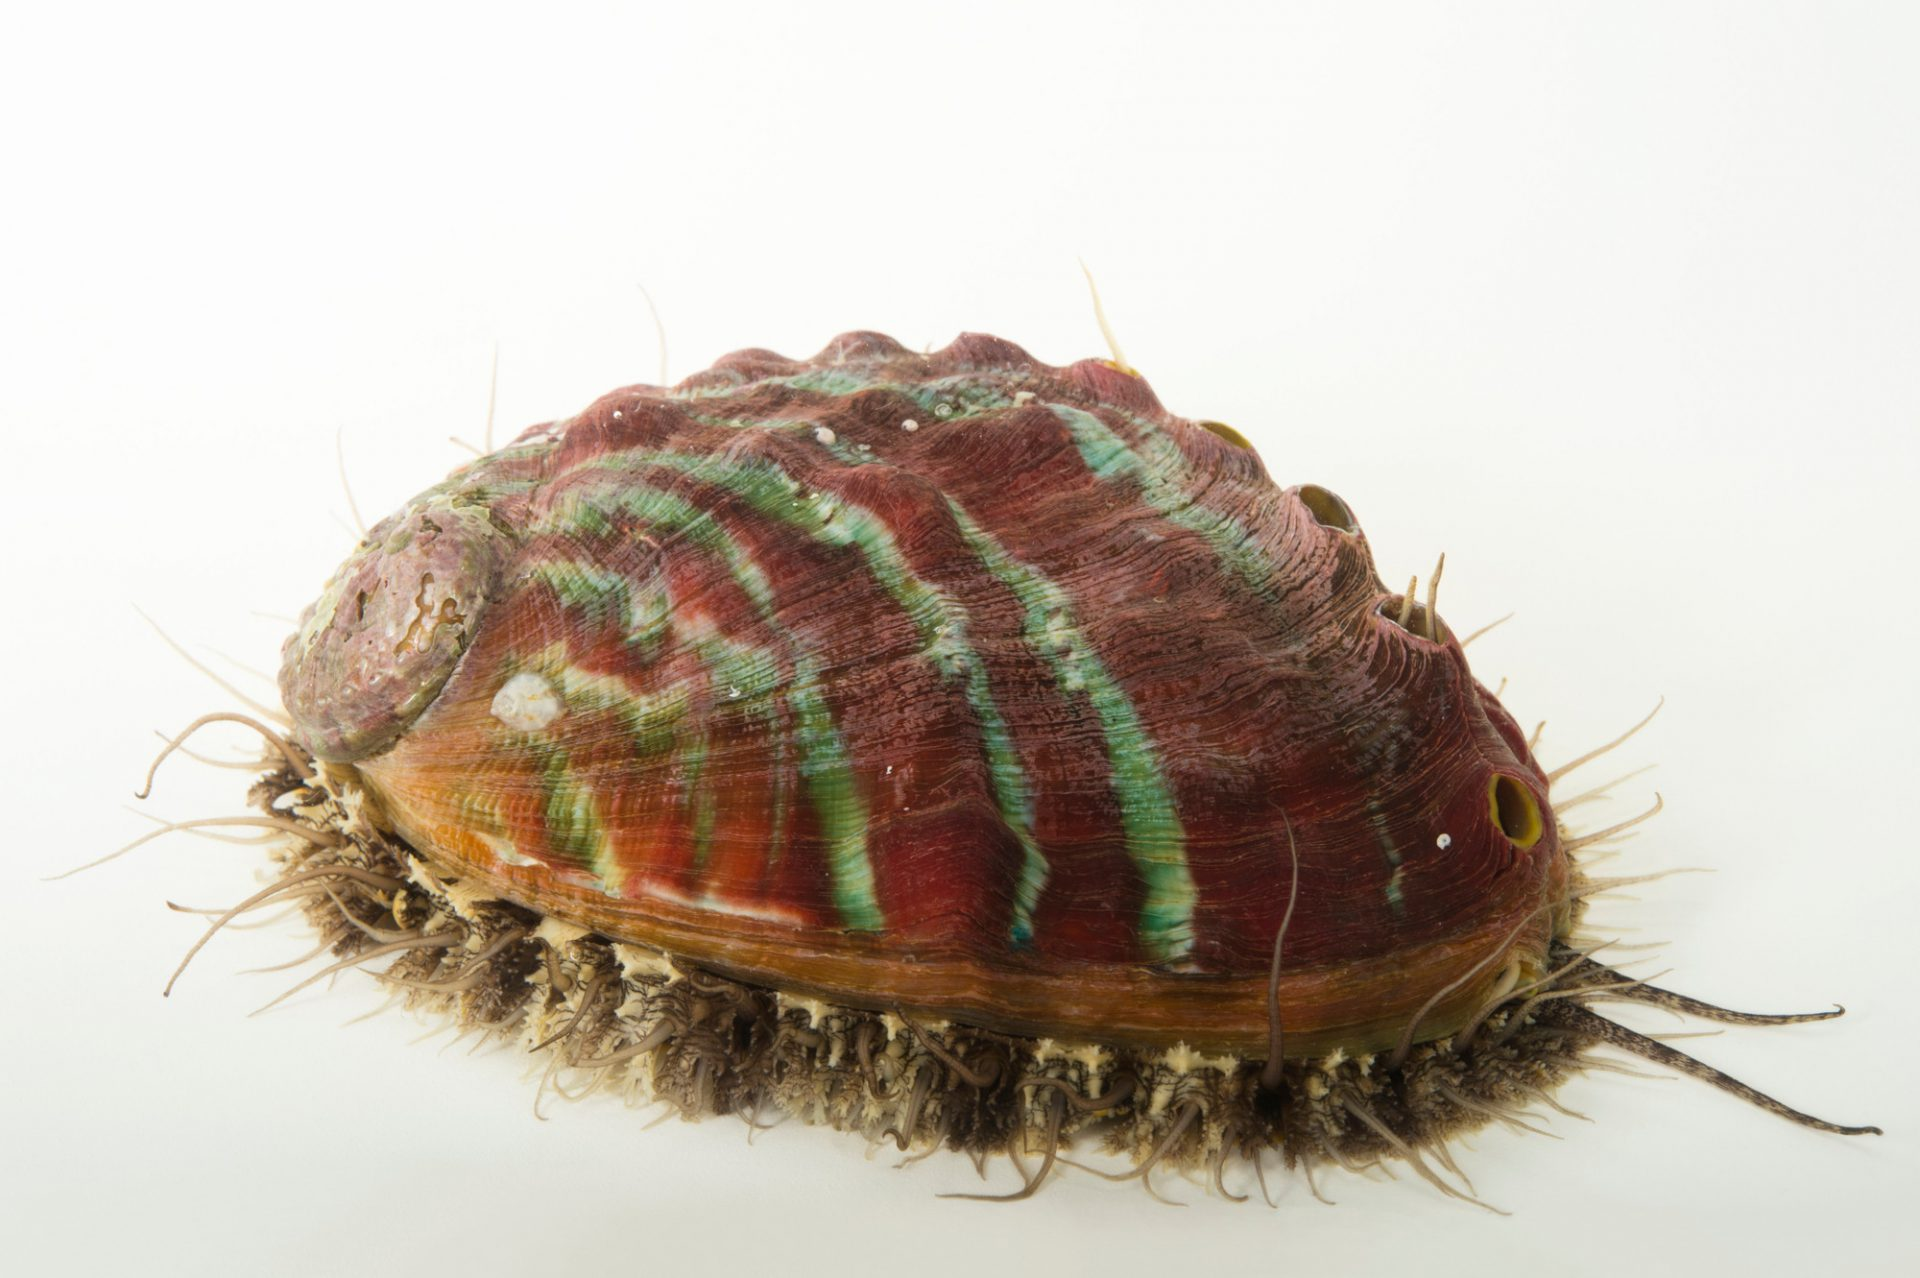 Photo: Pinto abalone (Haliotis kamtschatkana) at Alutiiq Pride Shellfish Hatchery in Seward, AK.